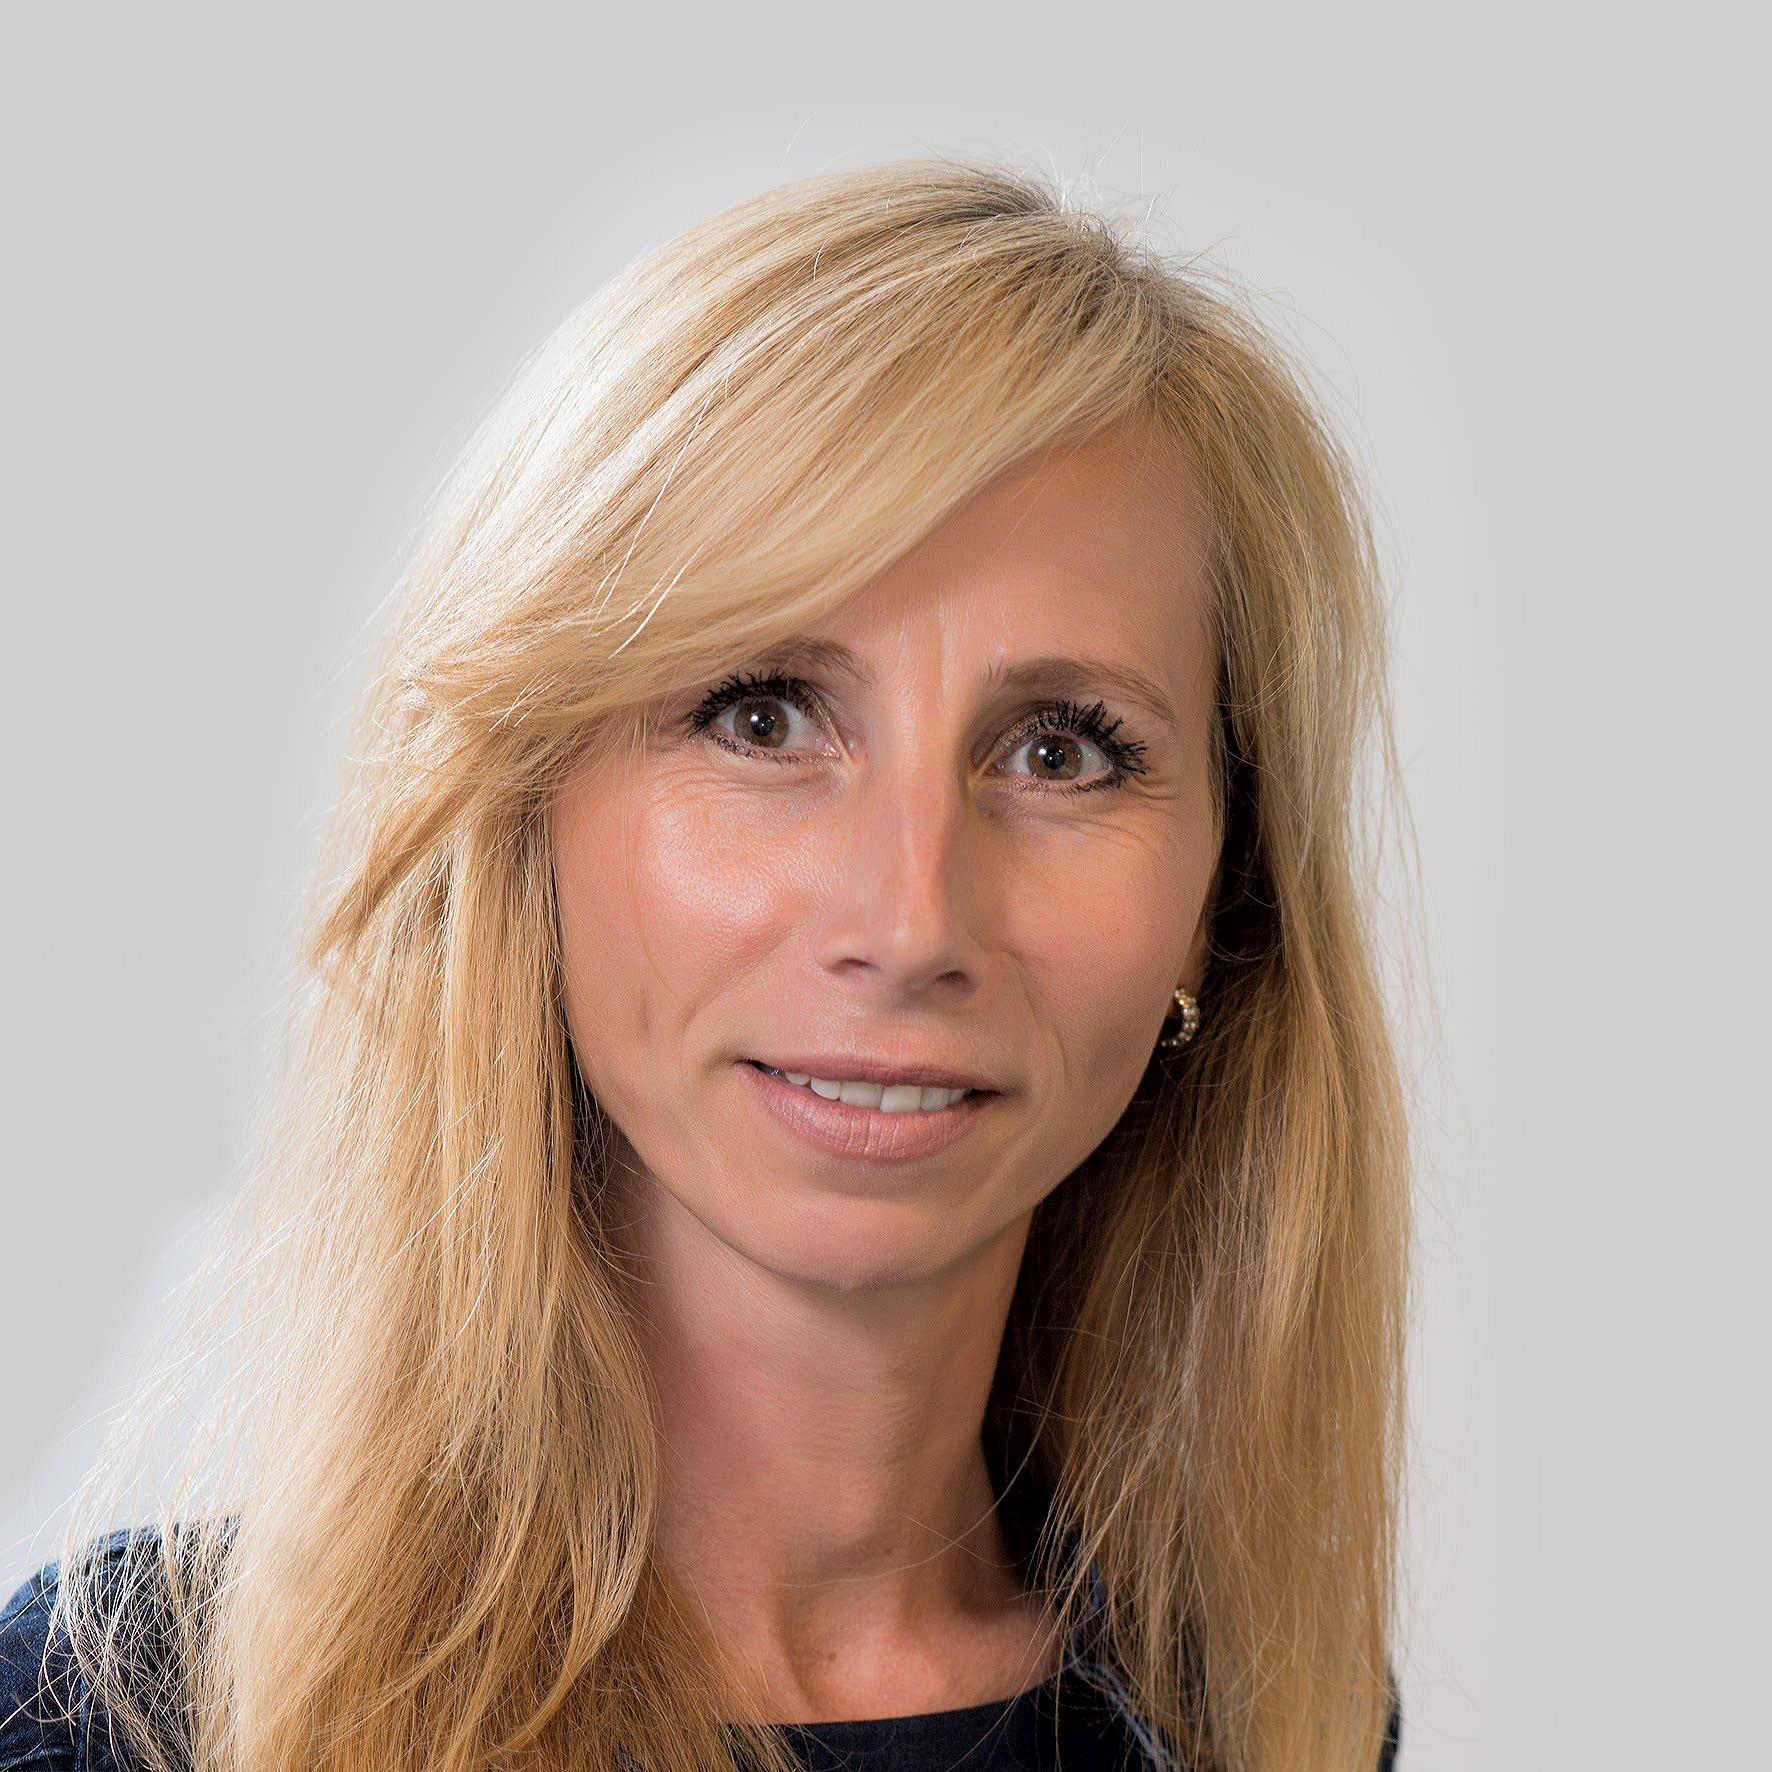 Linda Jongejan